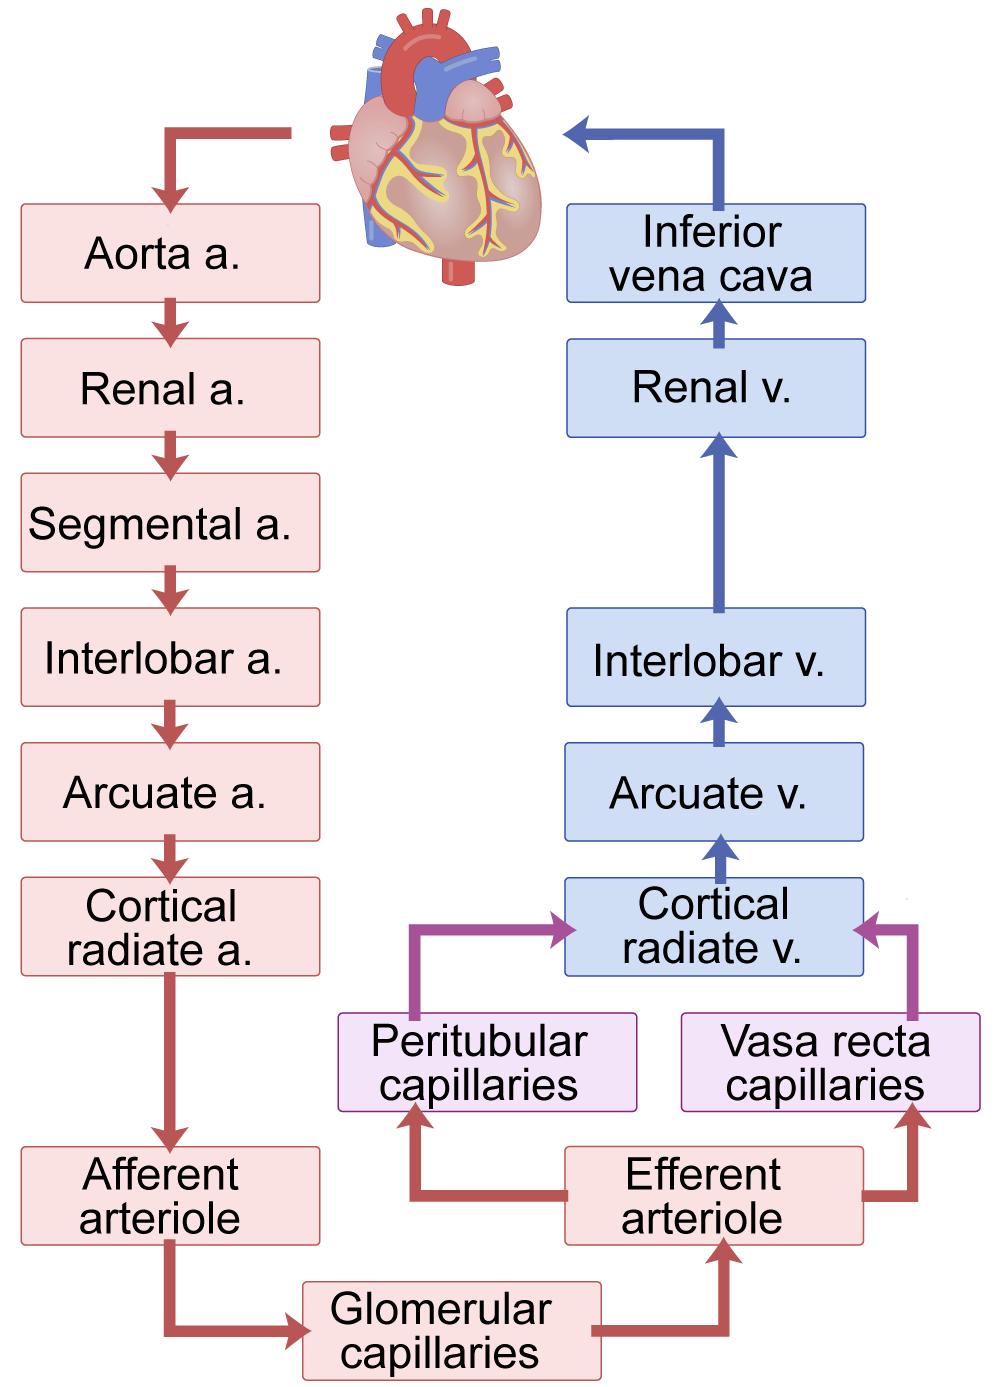 Kidney blood flow chart; renal circulation chart